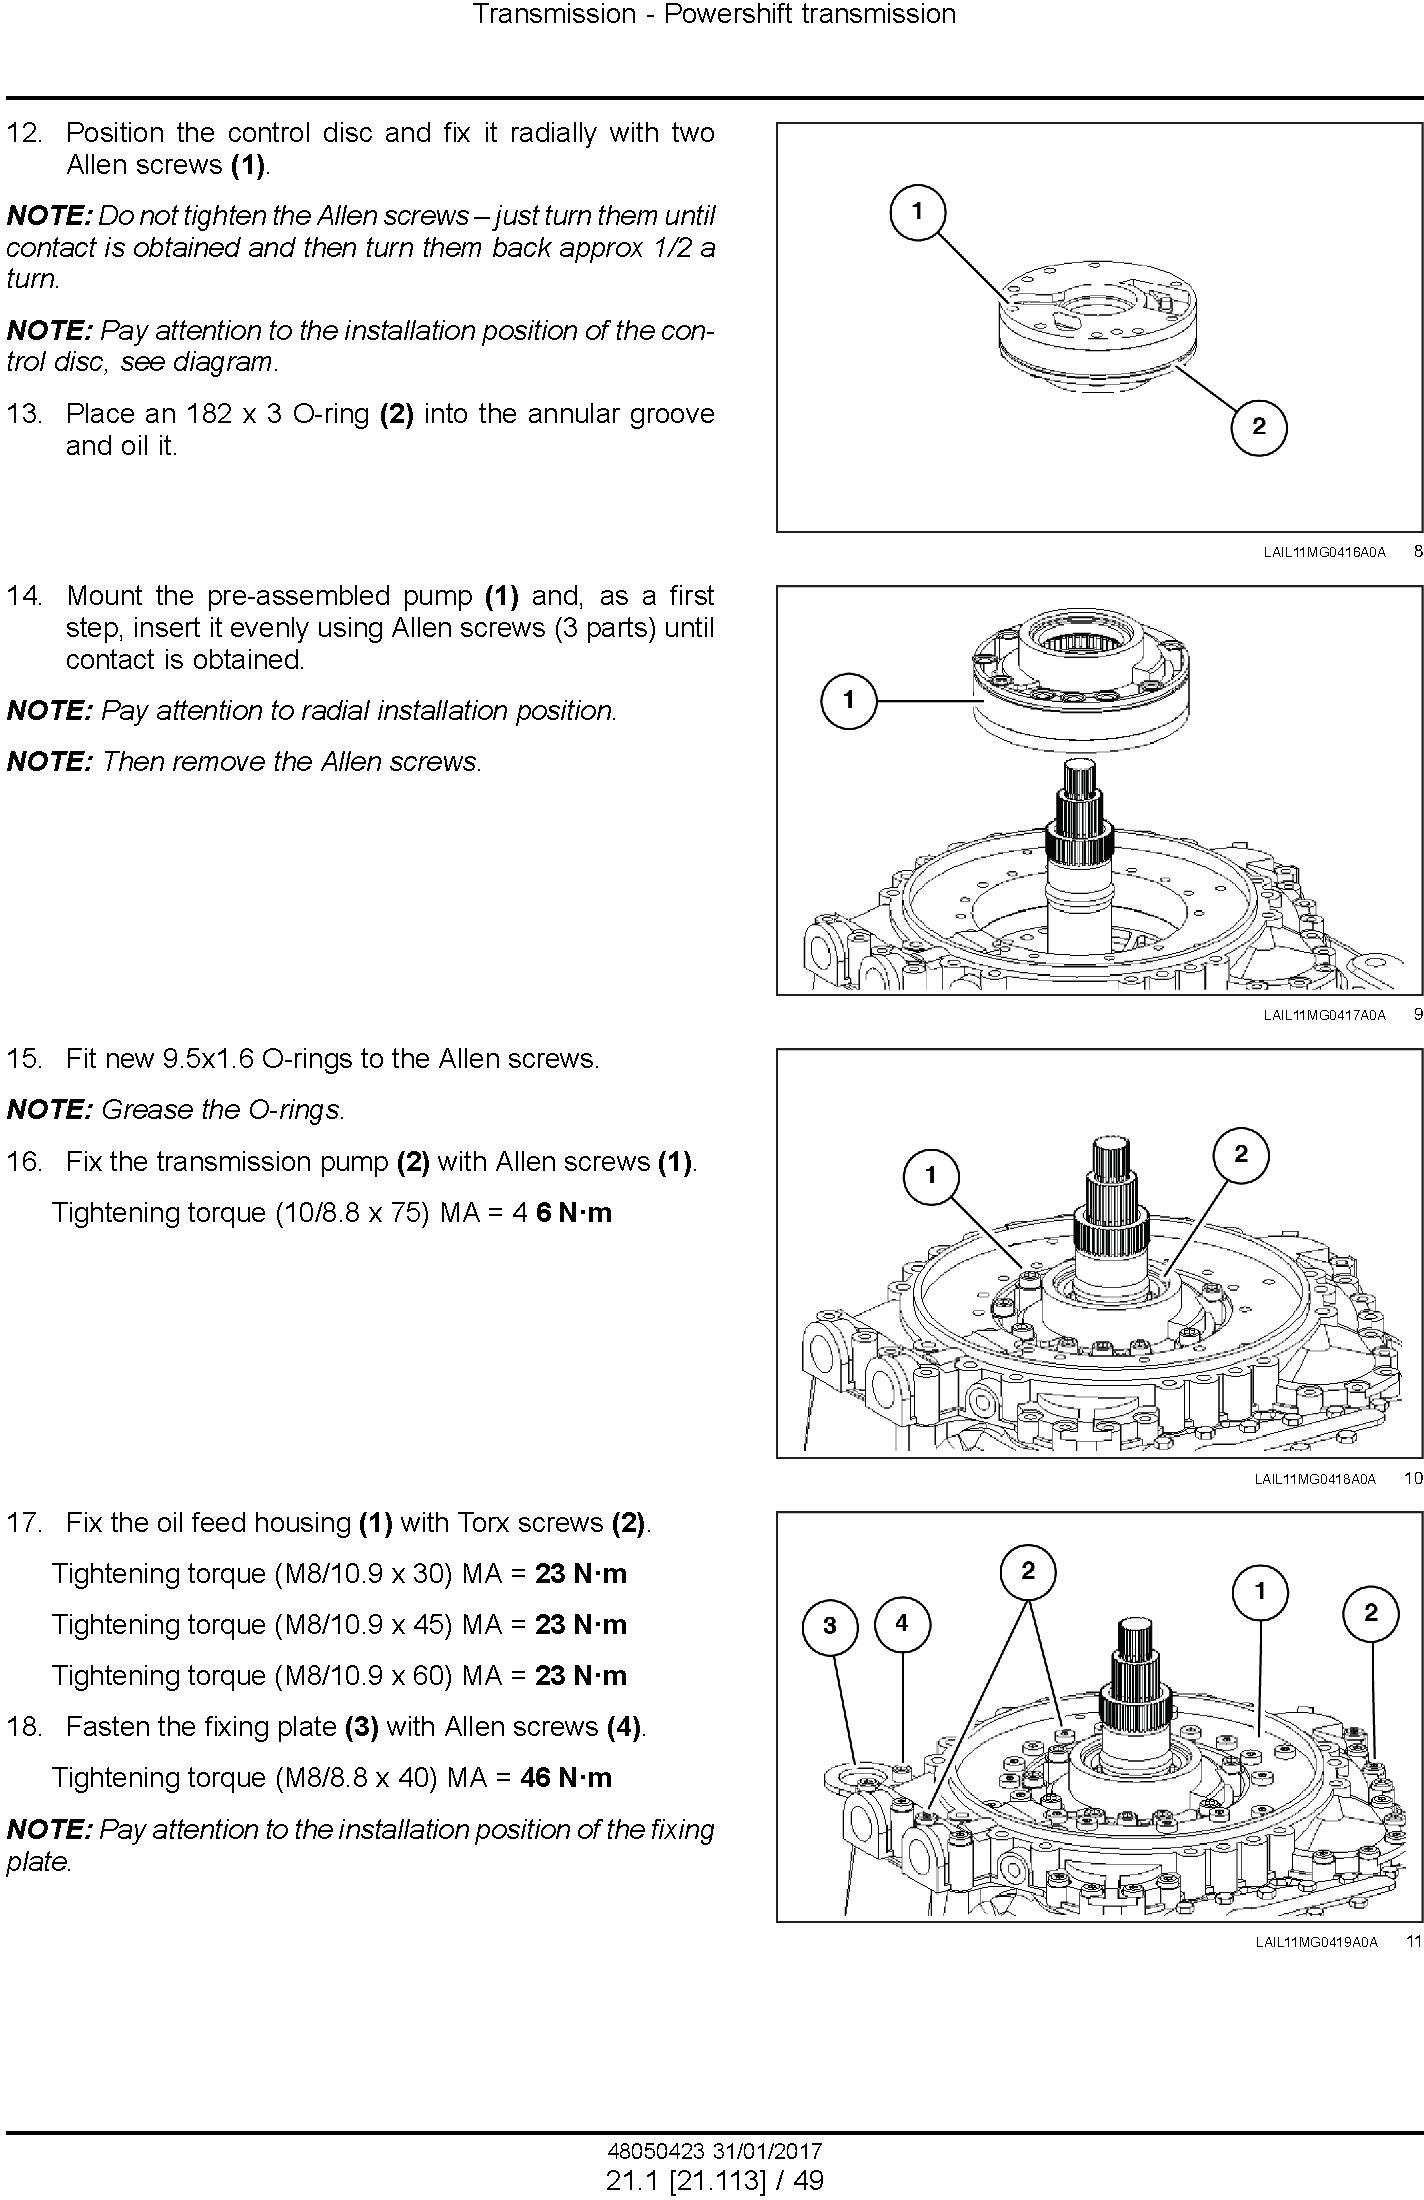 New Holland RG140.B, RG170.B, RG200.B Motor grader Service Manual (Brasil) - 2